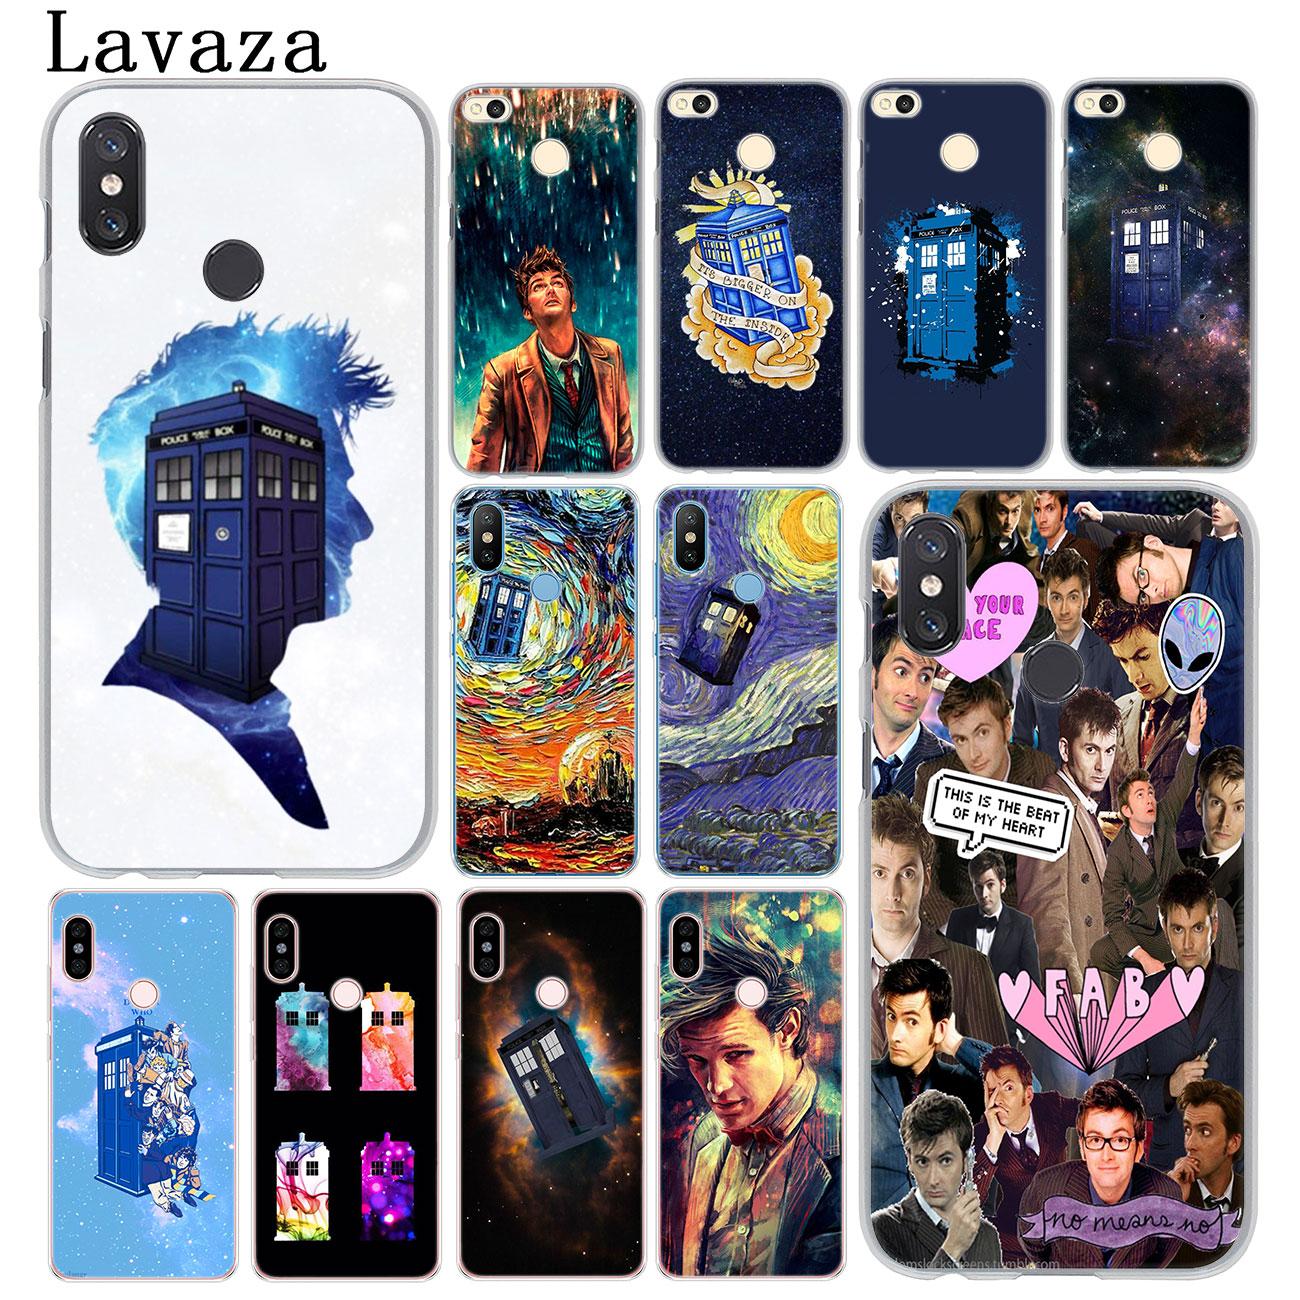 Phone Bags & Cases Yimaoc Tardis Box Doctor Who Soft Silicone Phone Case For Xiaomi Mi 9 8 A2 Lite A1 6 Pocophone F1 Max 3 Black Mi9 Mi8 Mia2 Evident Effect